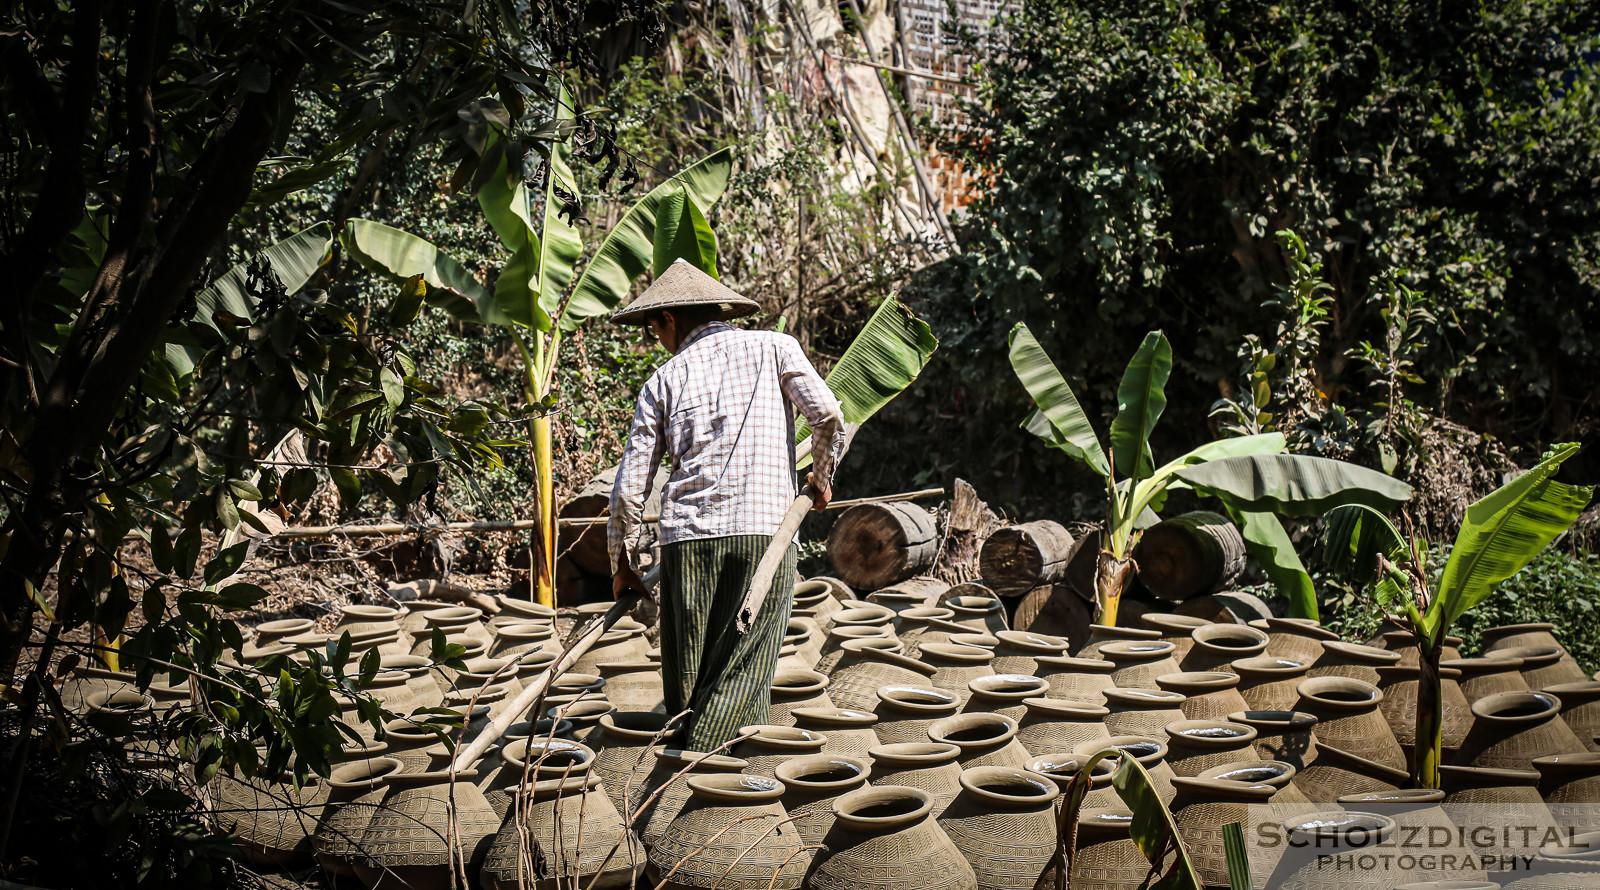 Asia, Birma, Burma, Exploring, globetrotter, Handwerk, Irrawaddy, Keramik, Mandalay, Myanmar, Southeastasia, Streetphotography, Töpferdorf, Töpferei, Töpfern, Töpferstadt, travel, Travelling, travelphotography, Wanderlust, Yandabo